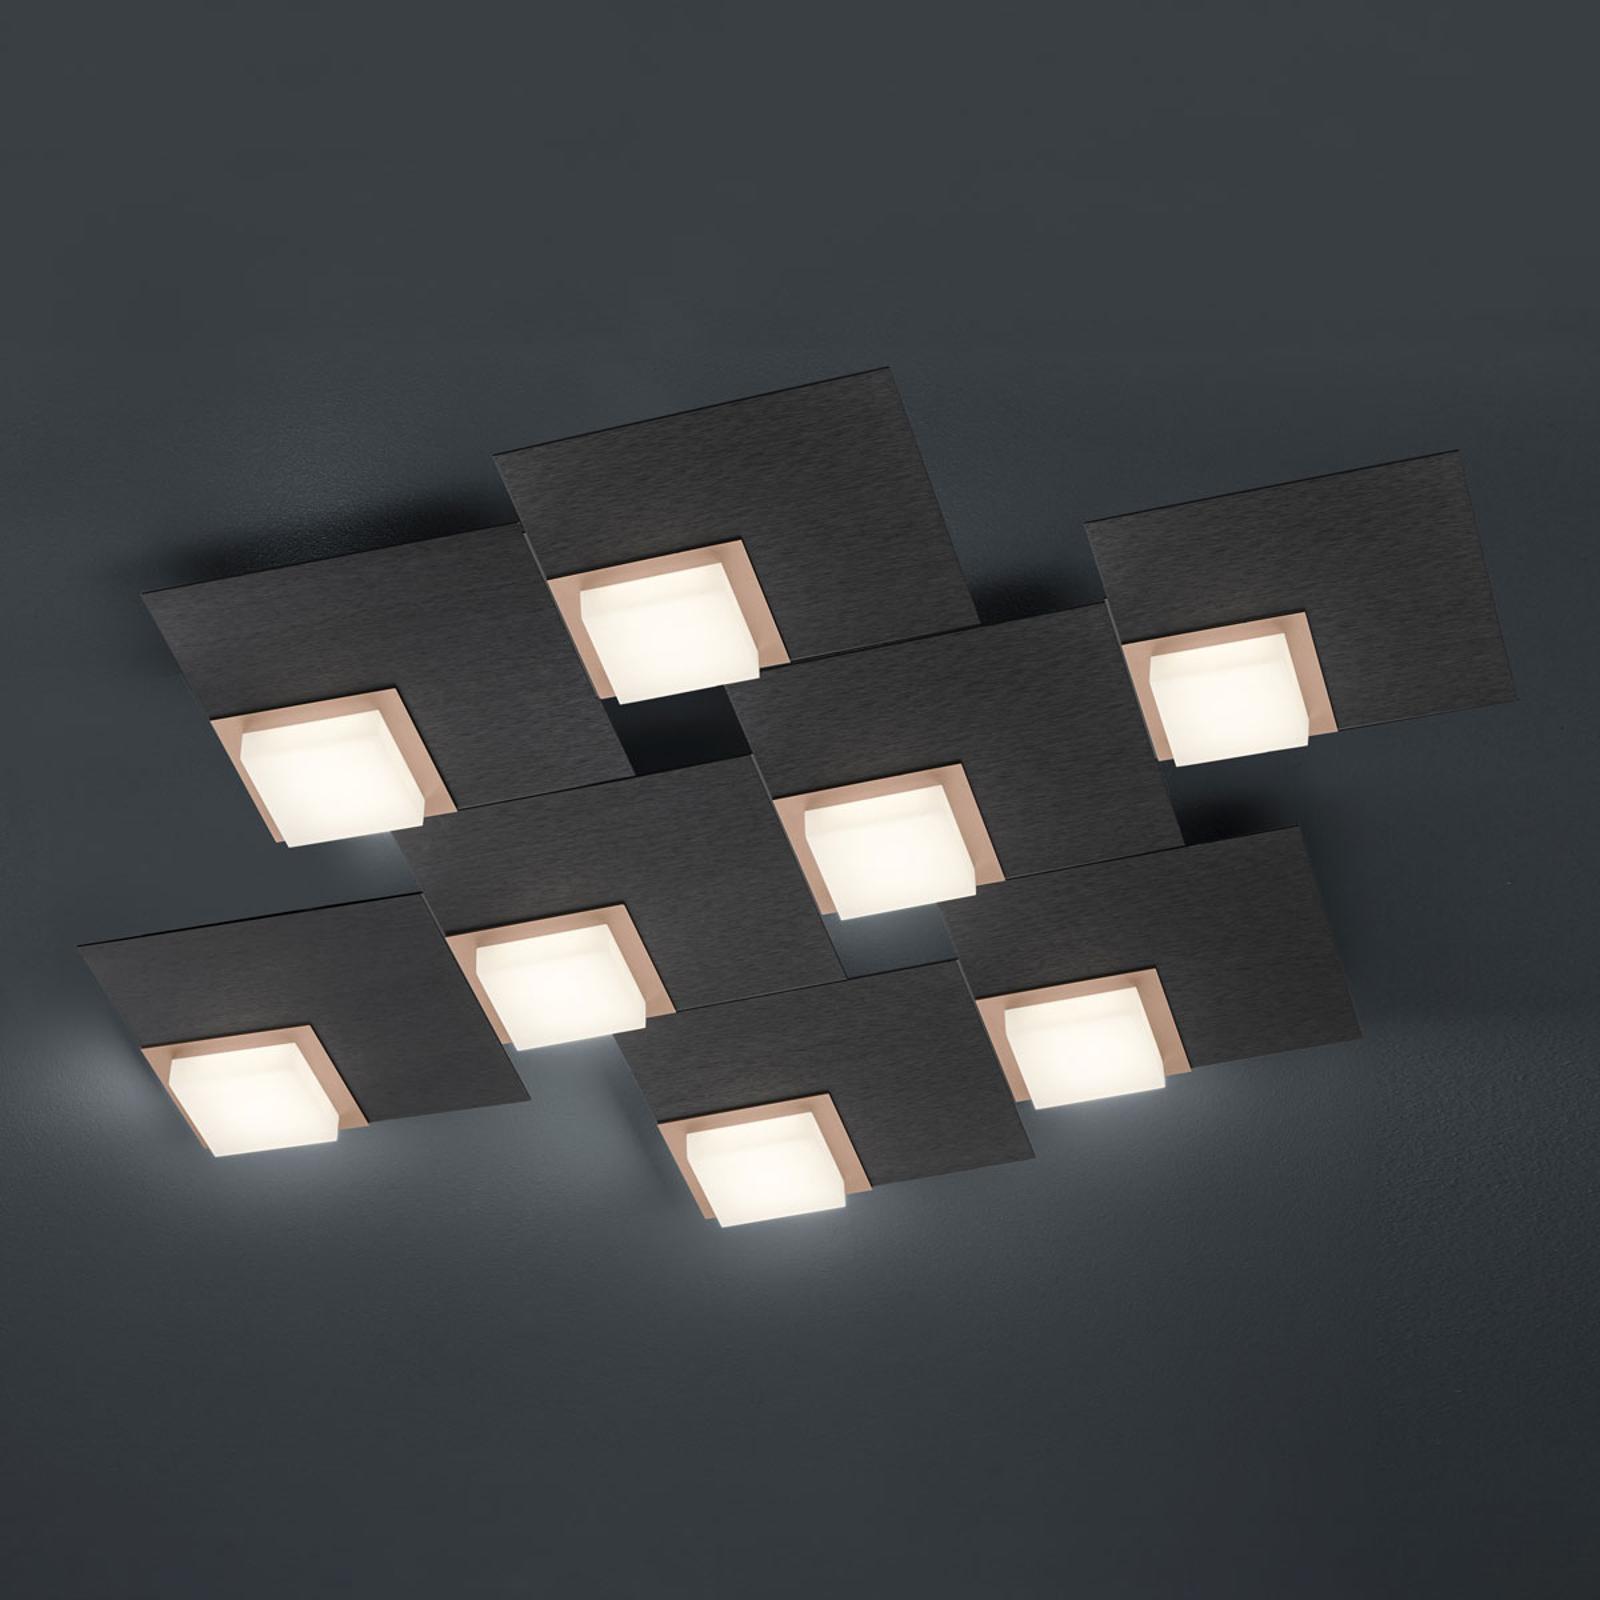 BANKAMP Quadro LED-plafondlamp 64 W antraciet